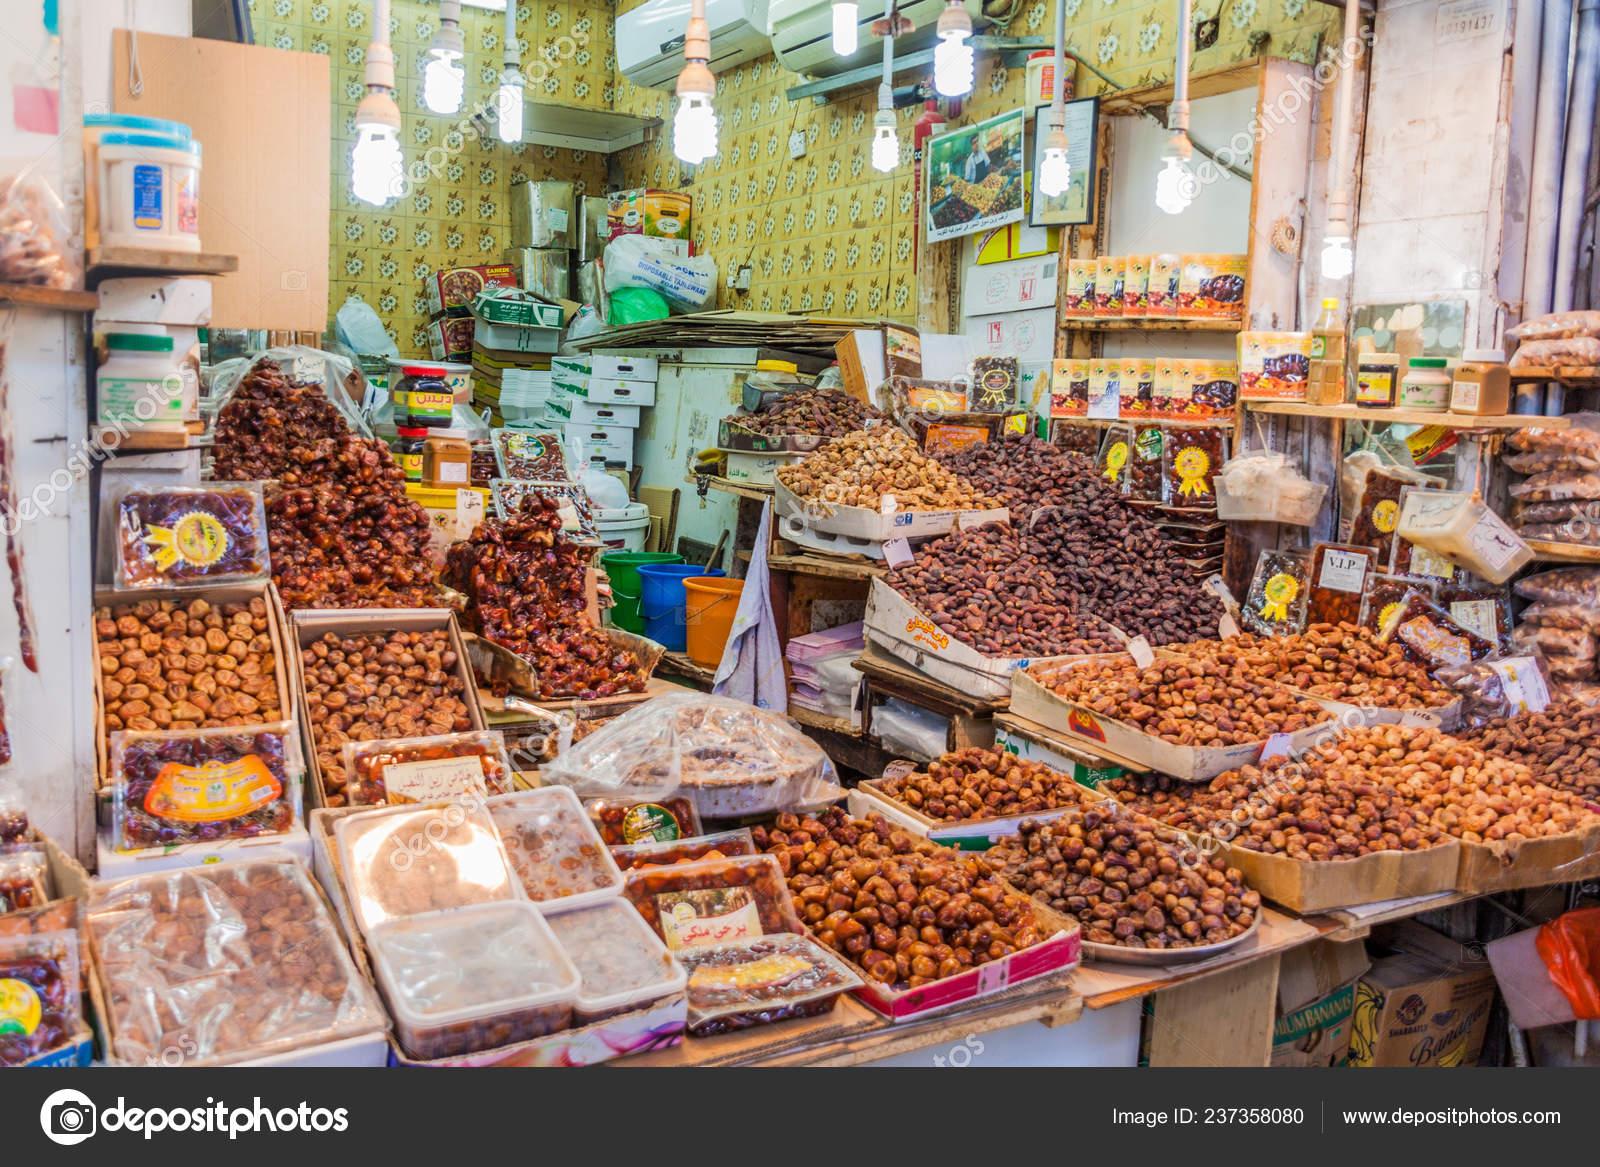 Kuwait City Kuwait March 2017 Date Stall Souq Market Kuwait – Stock